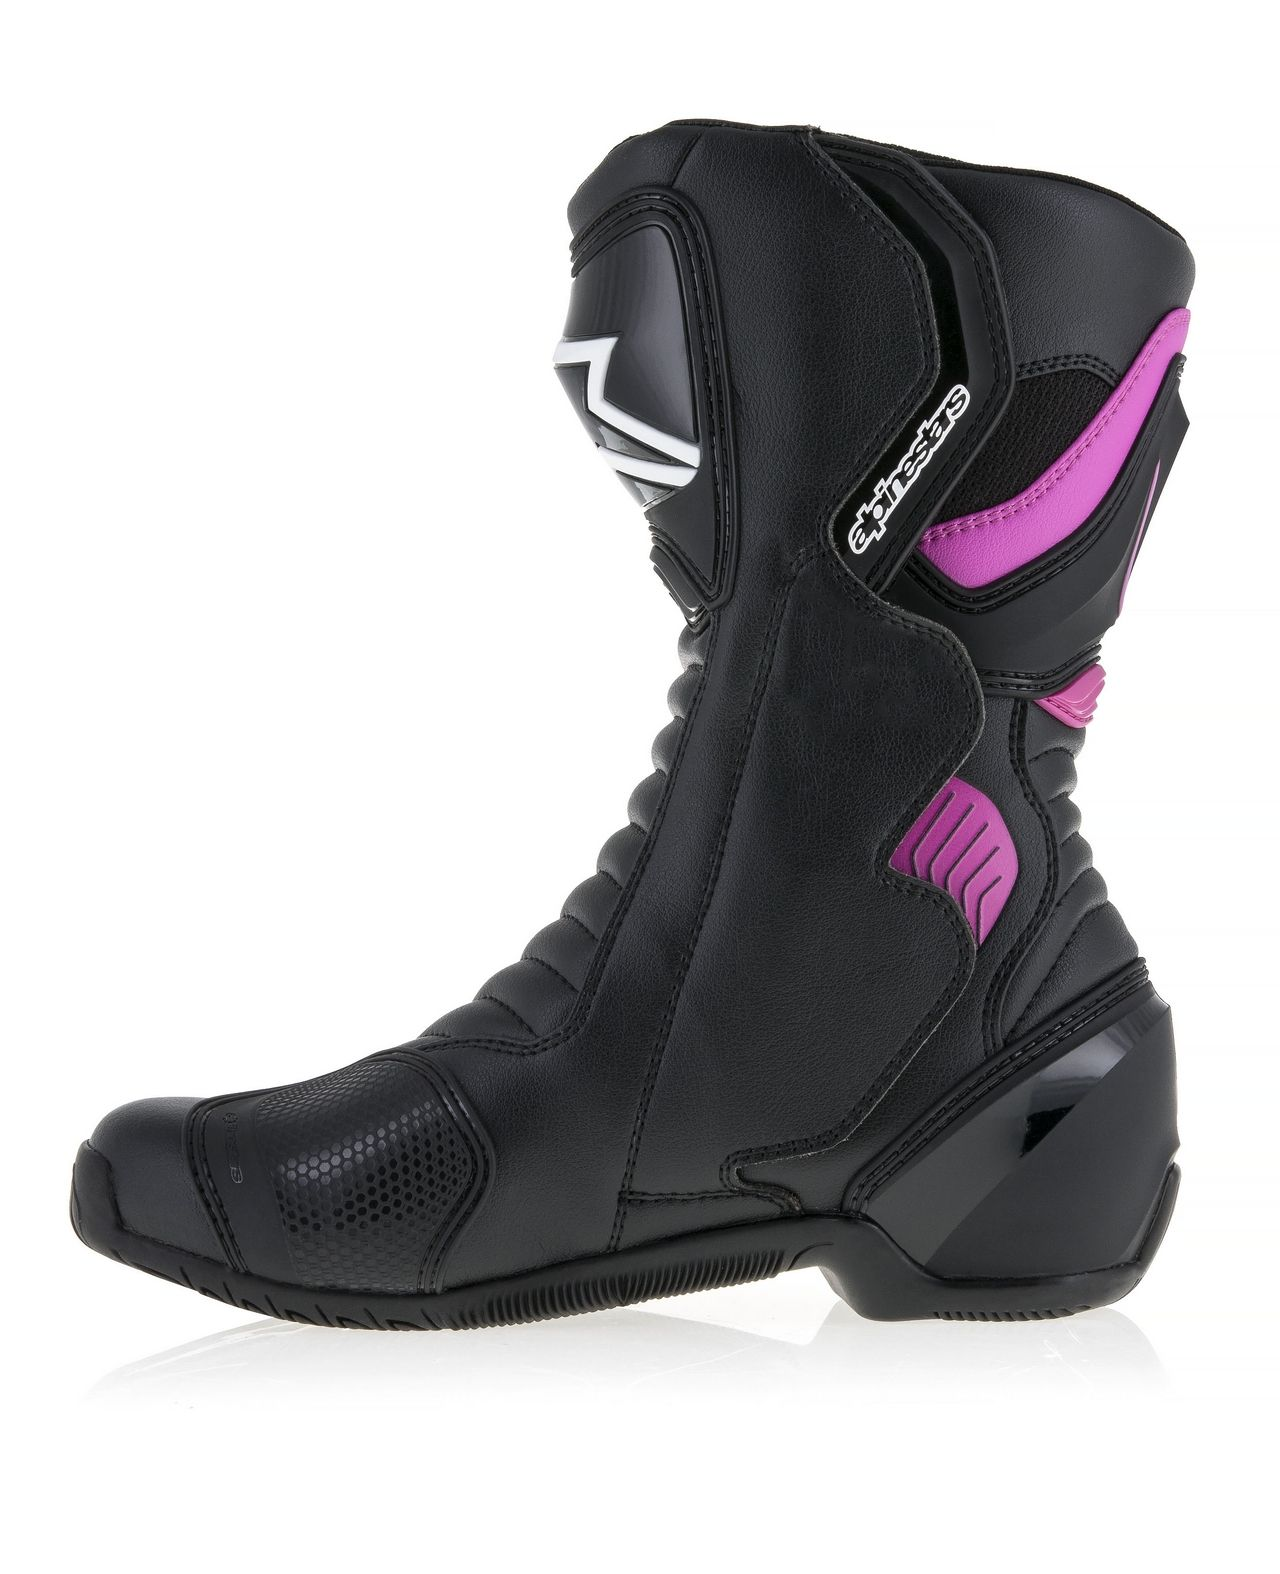 Alpinestars Stella SMX 6 V2 Ladies Motorcycle Boots buy